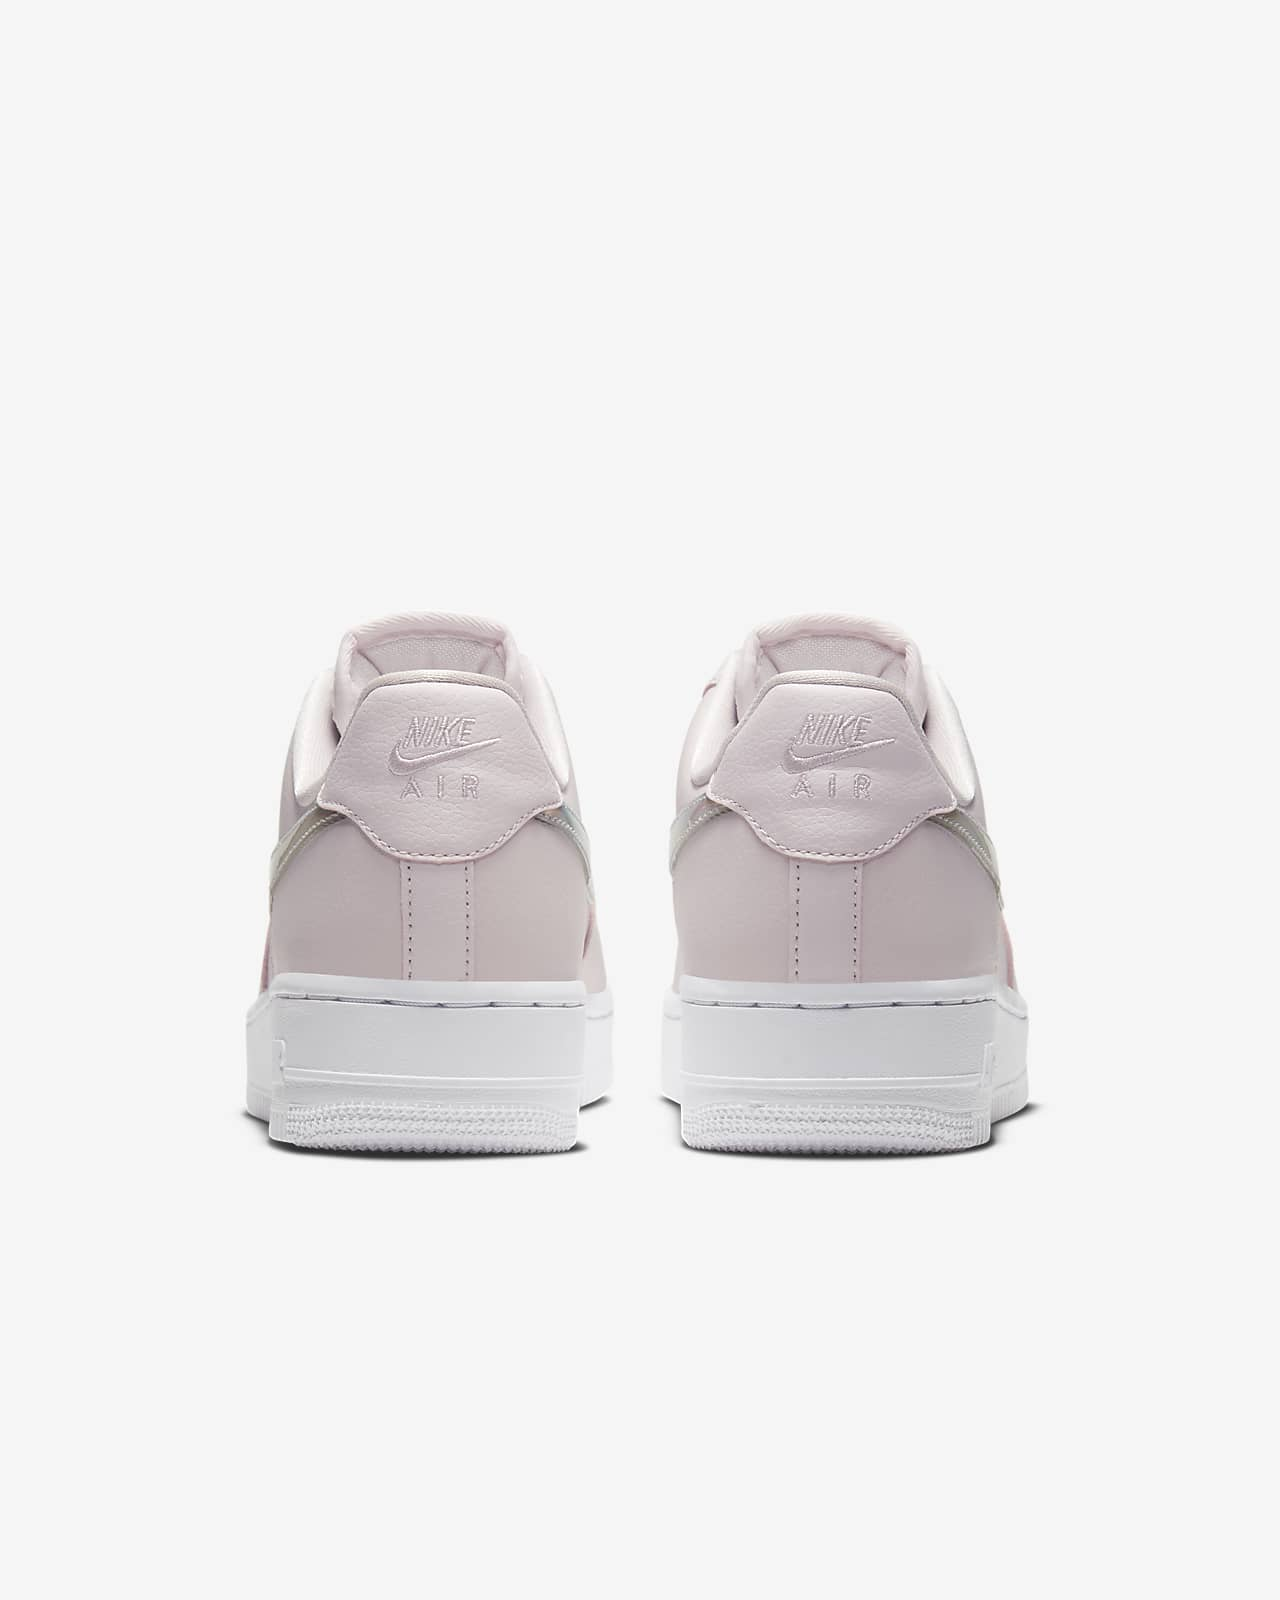 nike air force 1 07 donna bianche e rosa